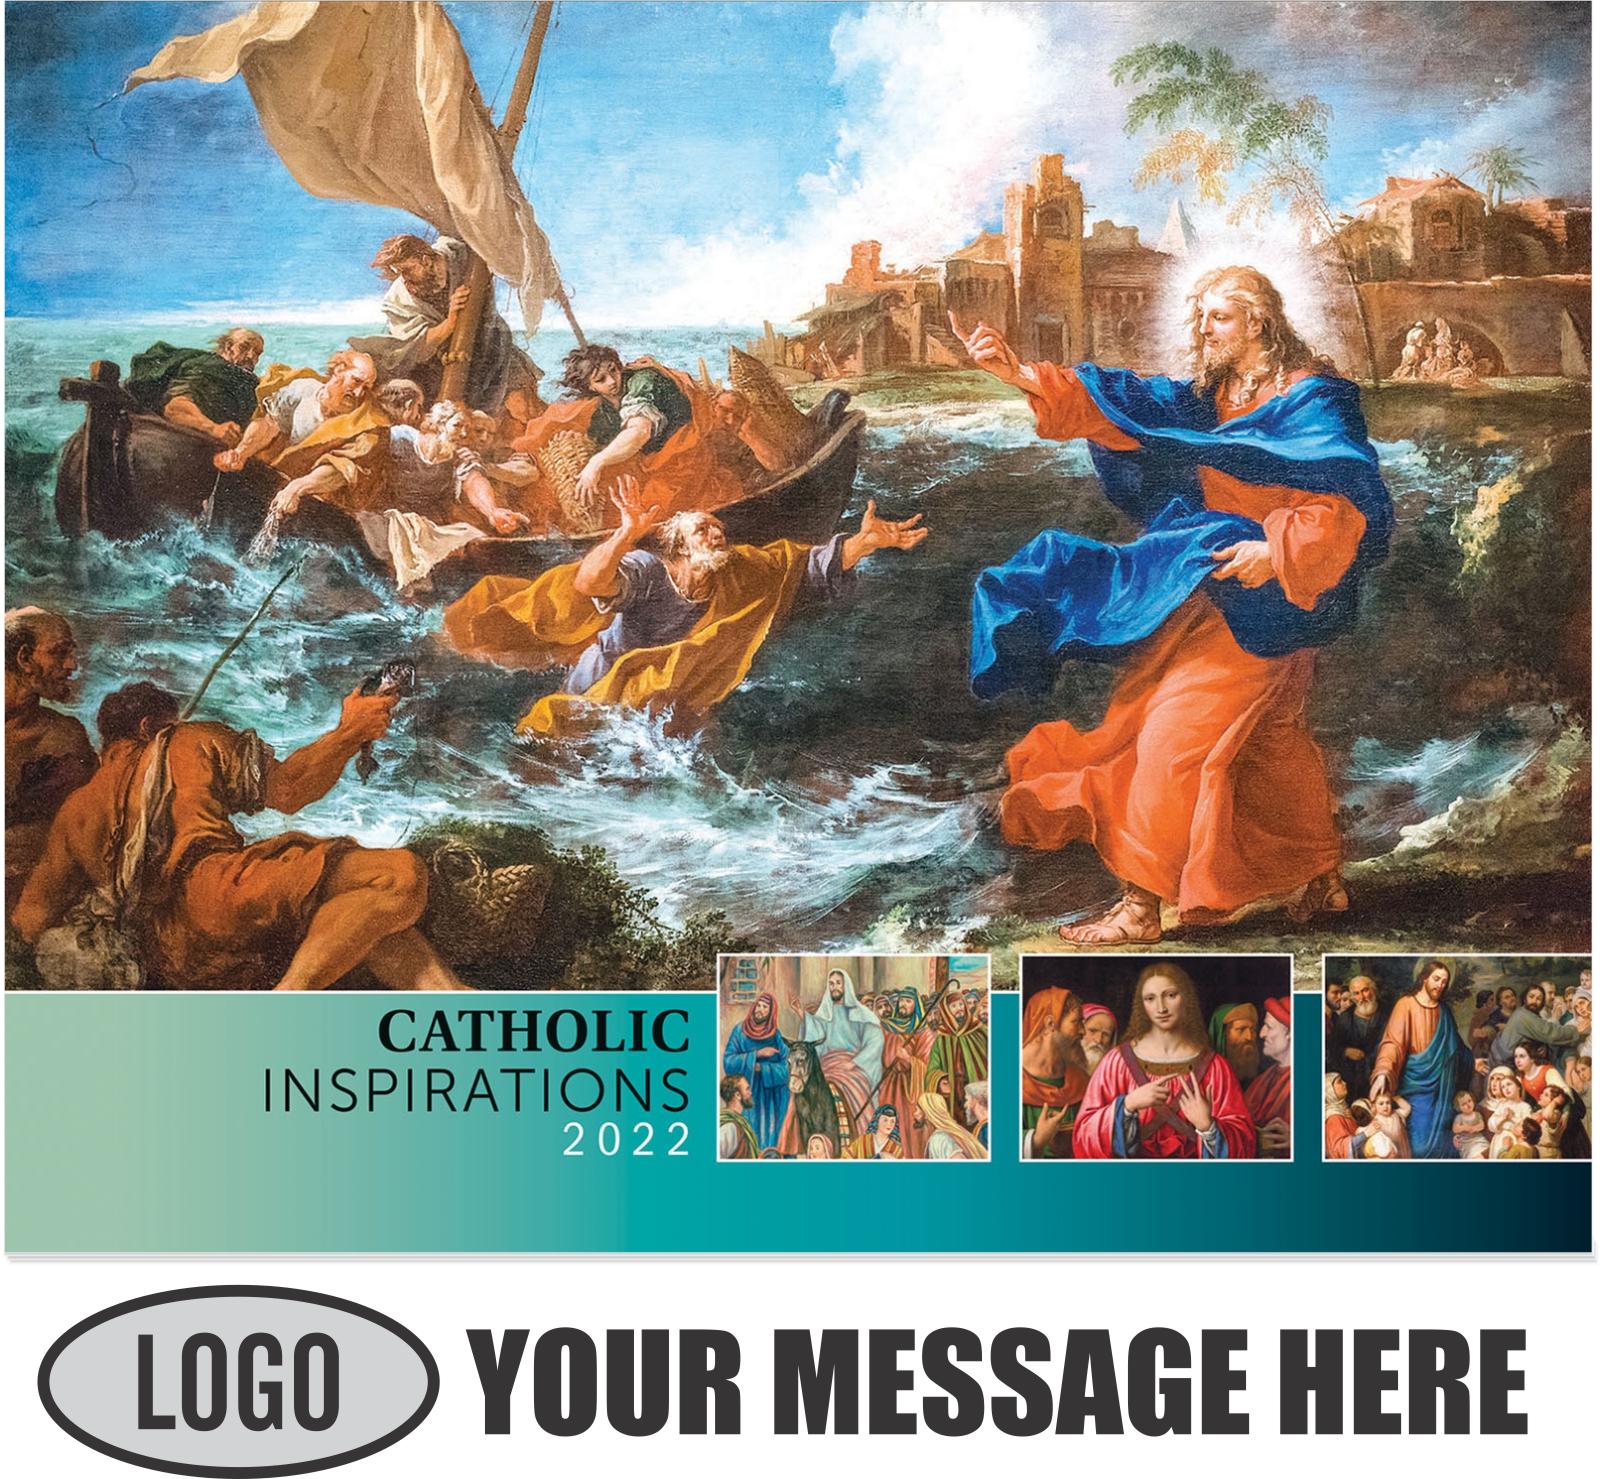 2022 Catholic Inspiration Promotional Calendar